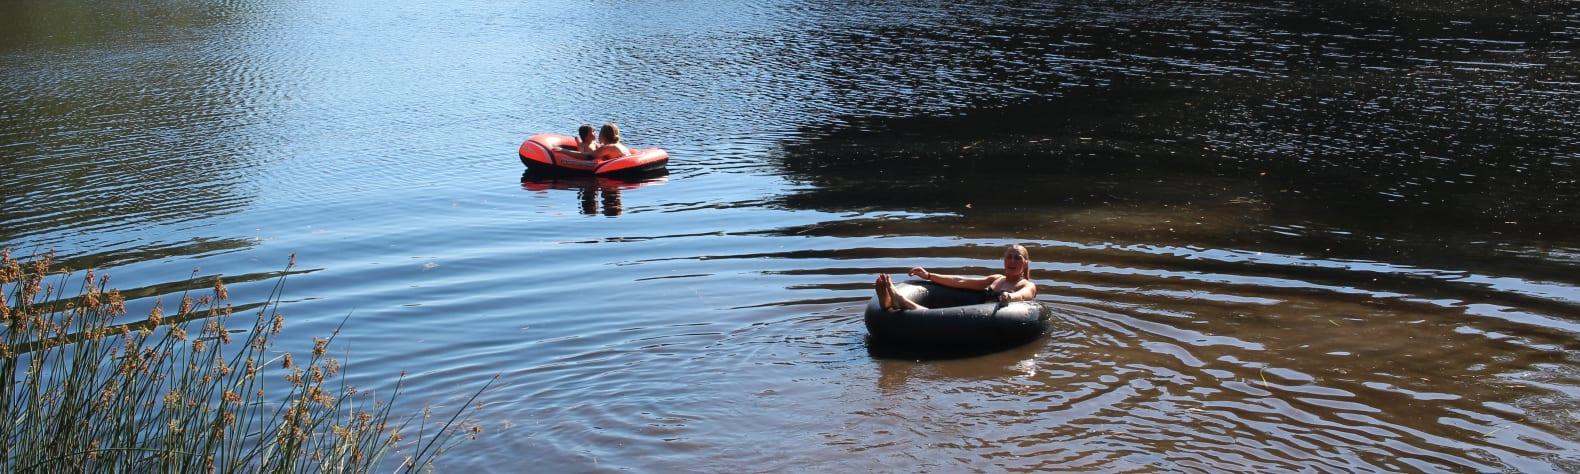 Clyde River Camp @ Brooman